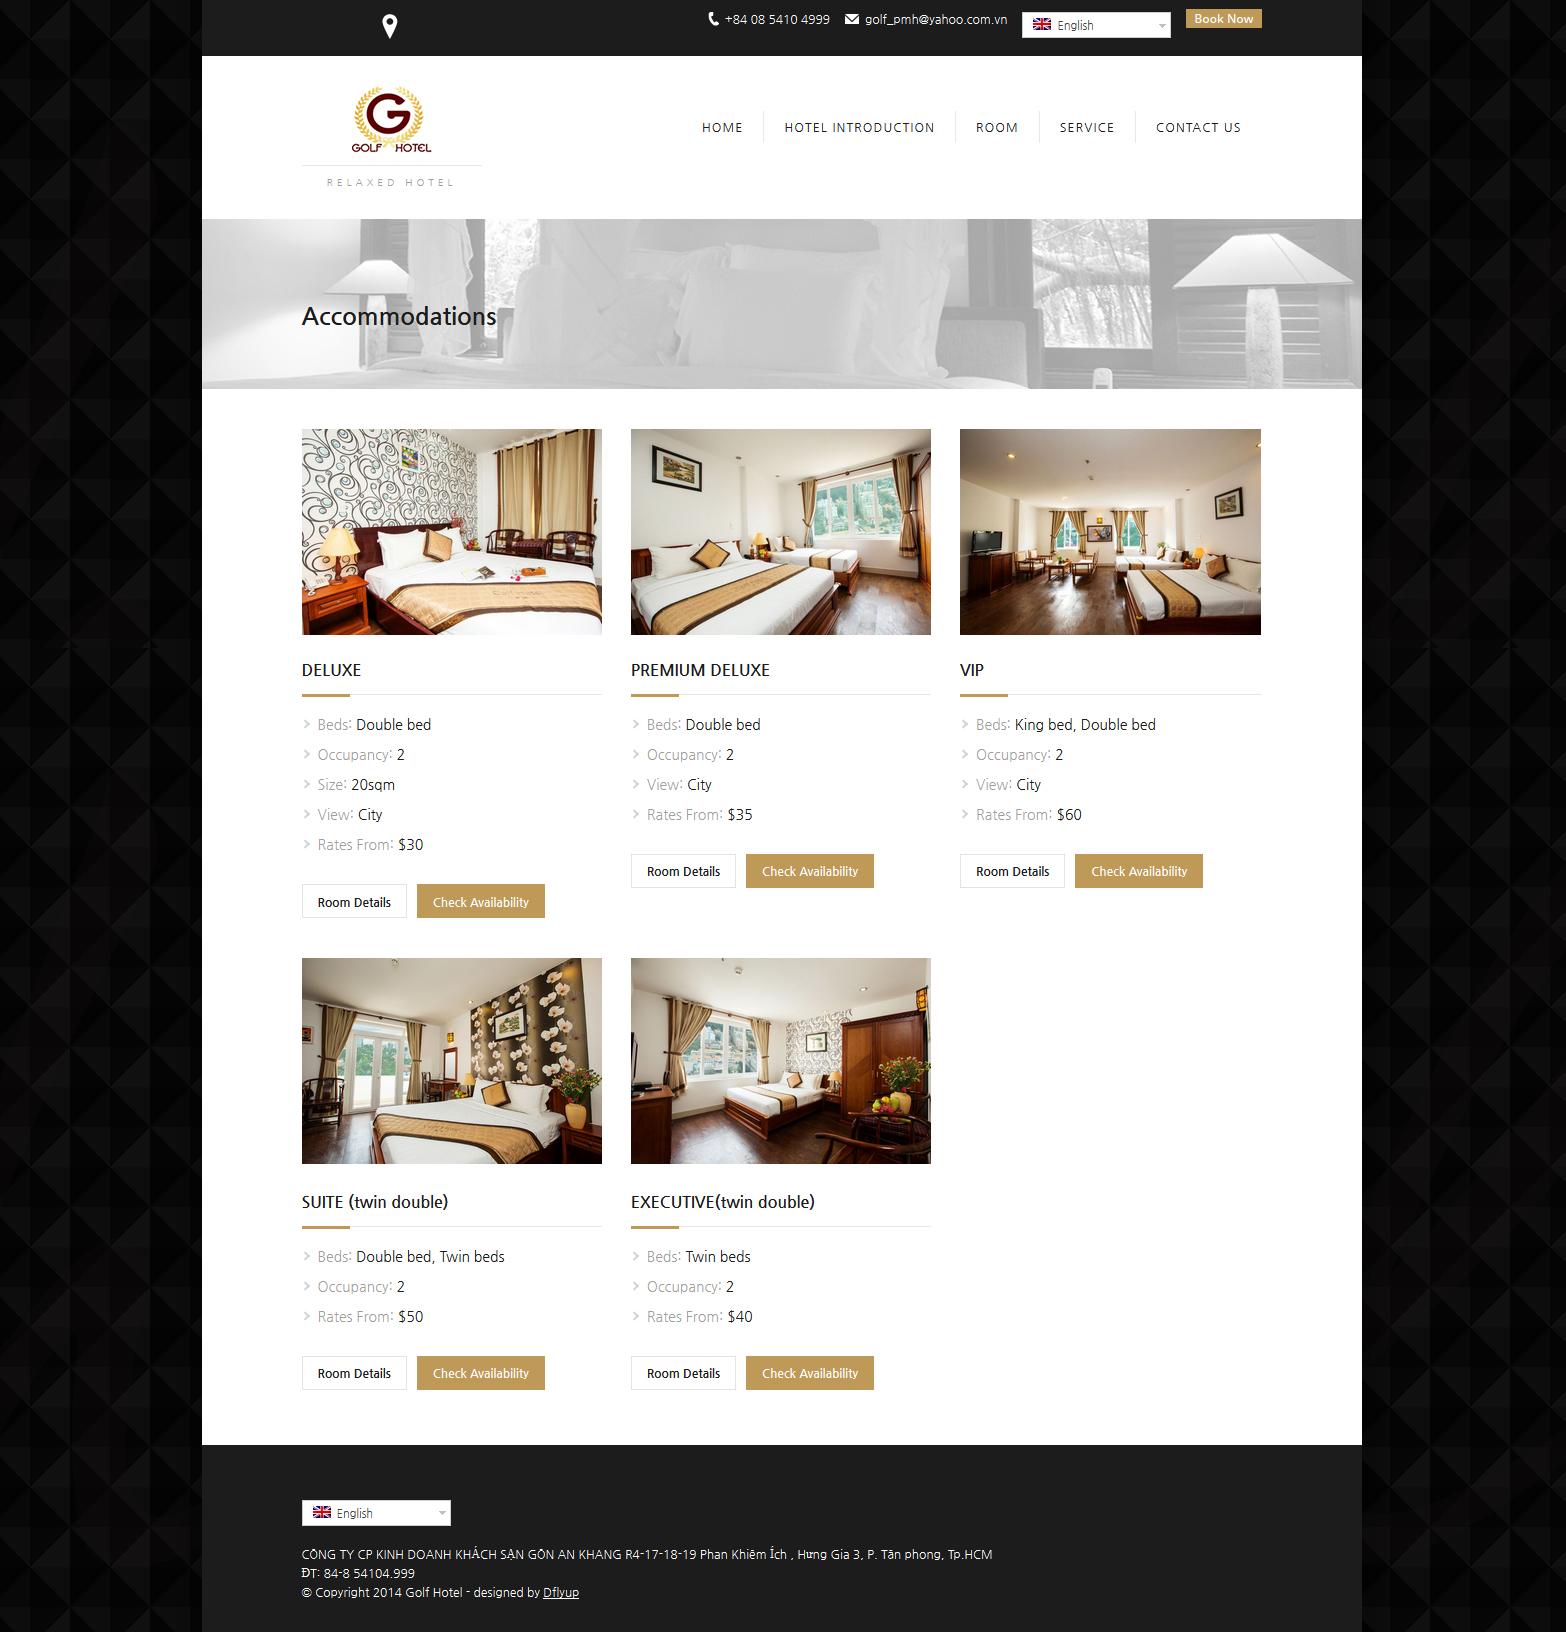 hotel website design, wordpress website design in vietnam,호텔 홈페이지 디자인, 워드프레스 웹사이트 가격